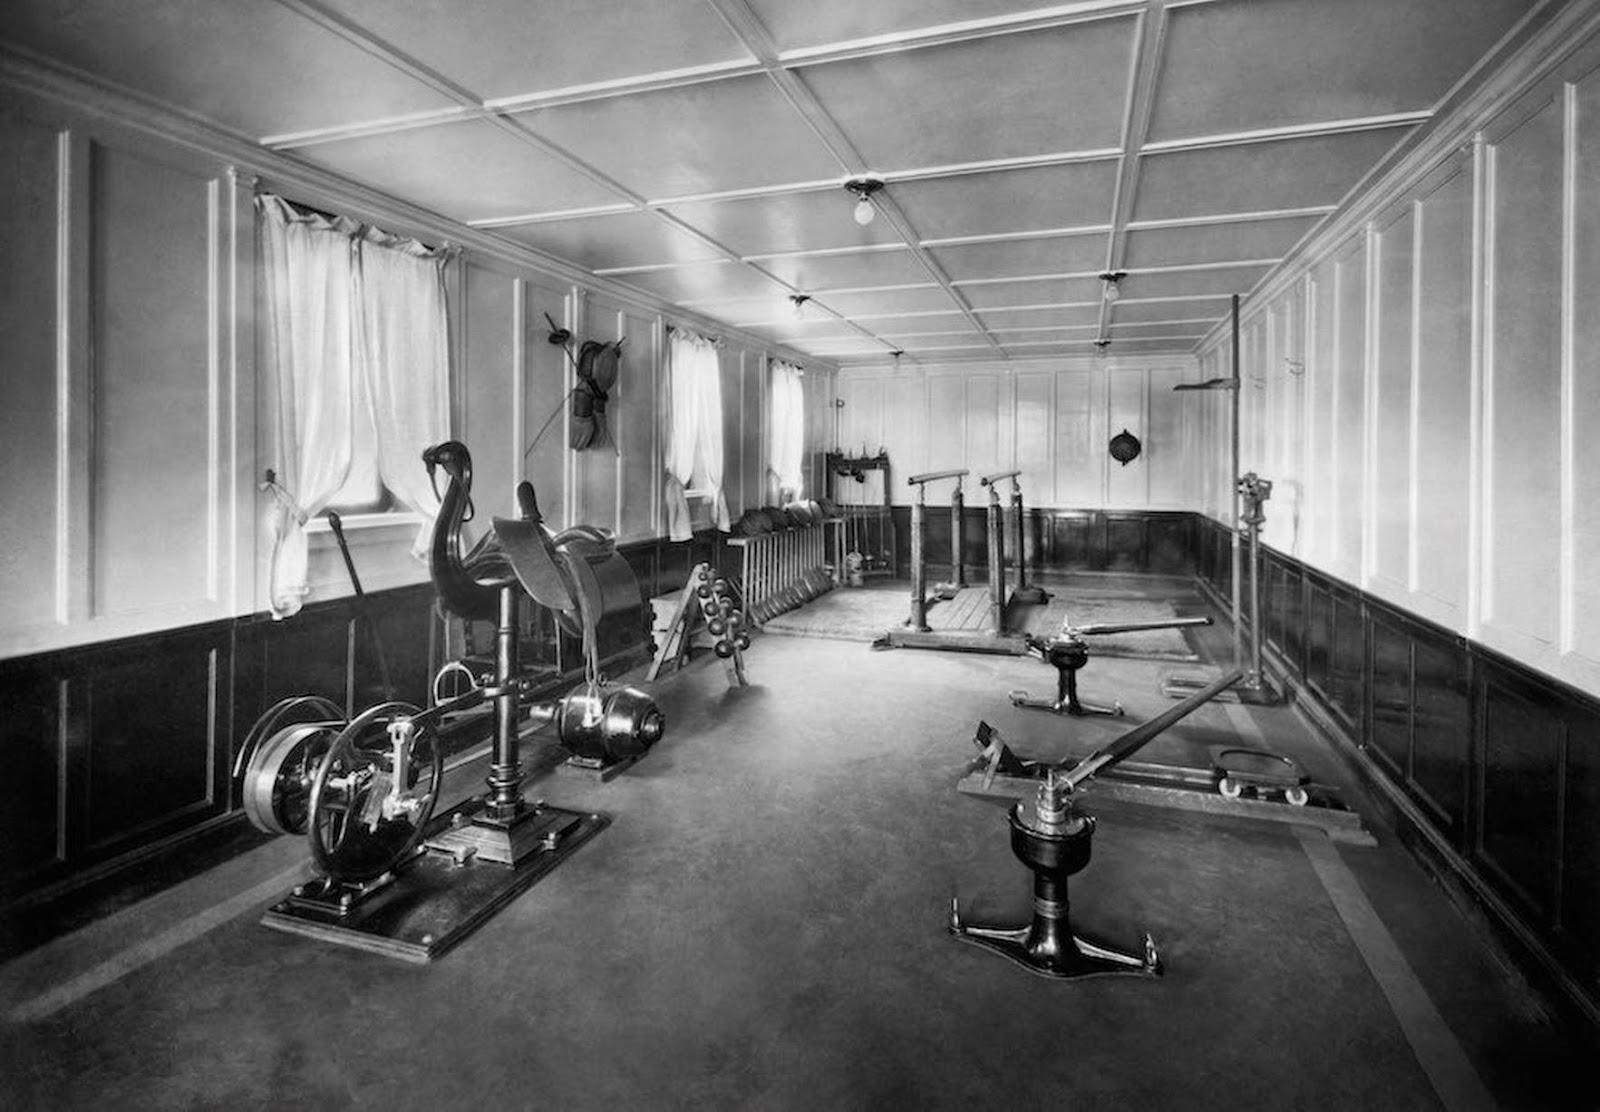 Gym of the Neptunia Transatlantic Liner (1930).